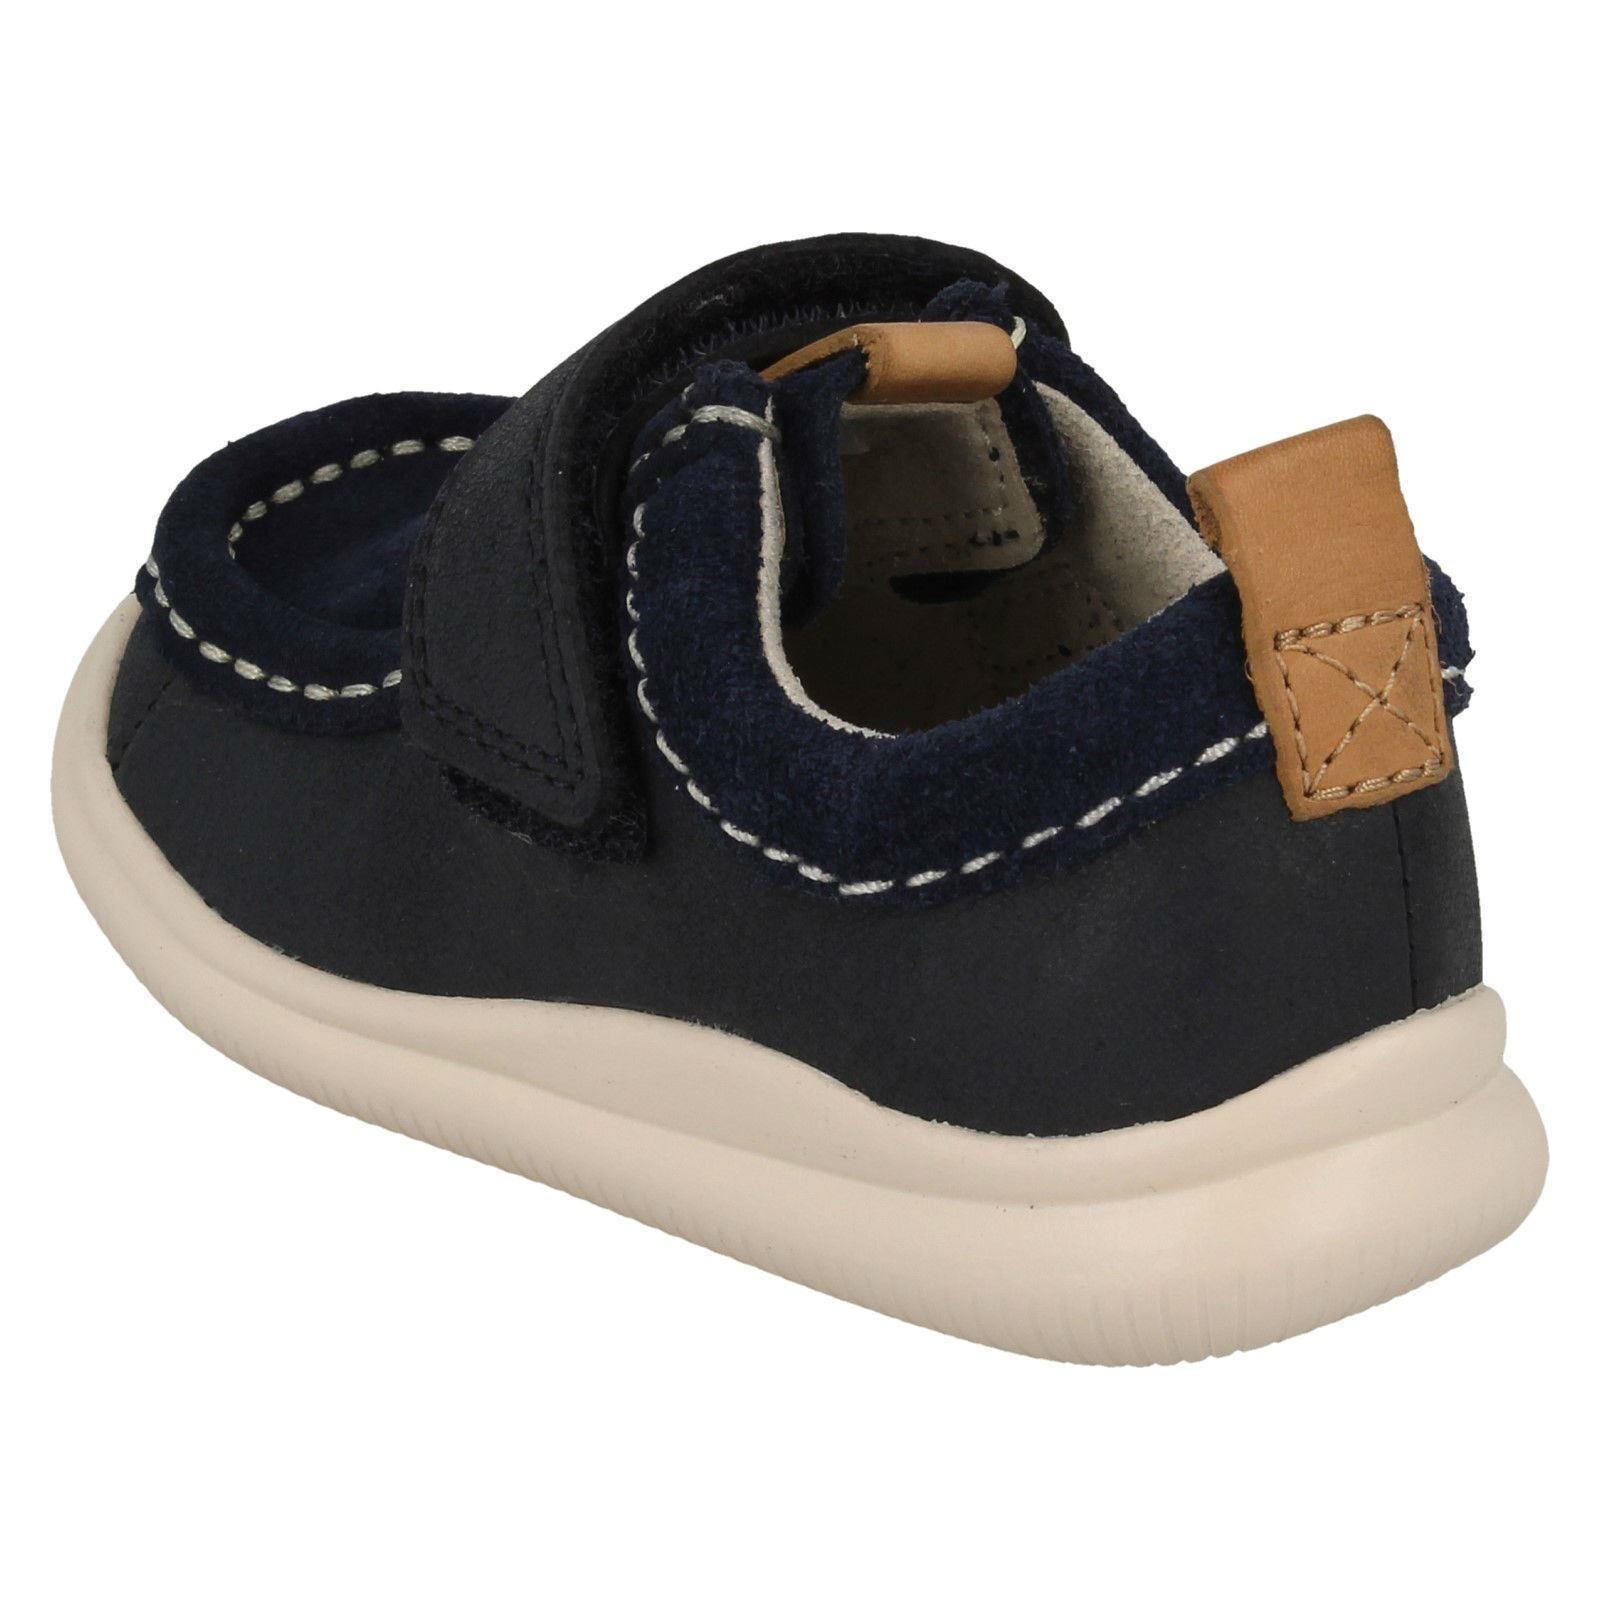 Chicos Sea' azul Navy Casual 'cloud Shoes Clarks rIw8qBr